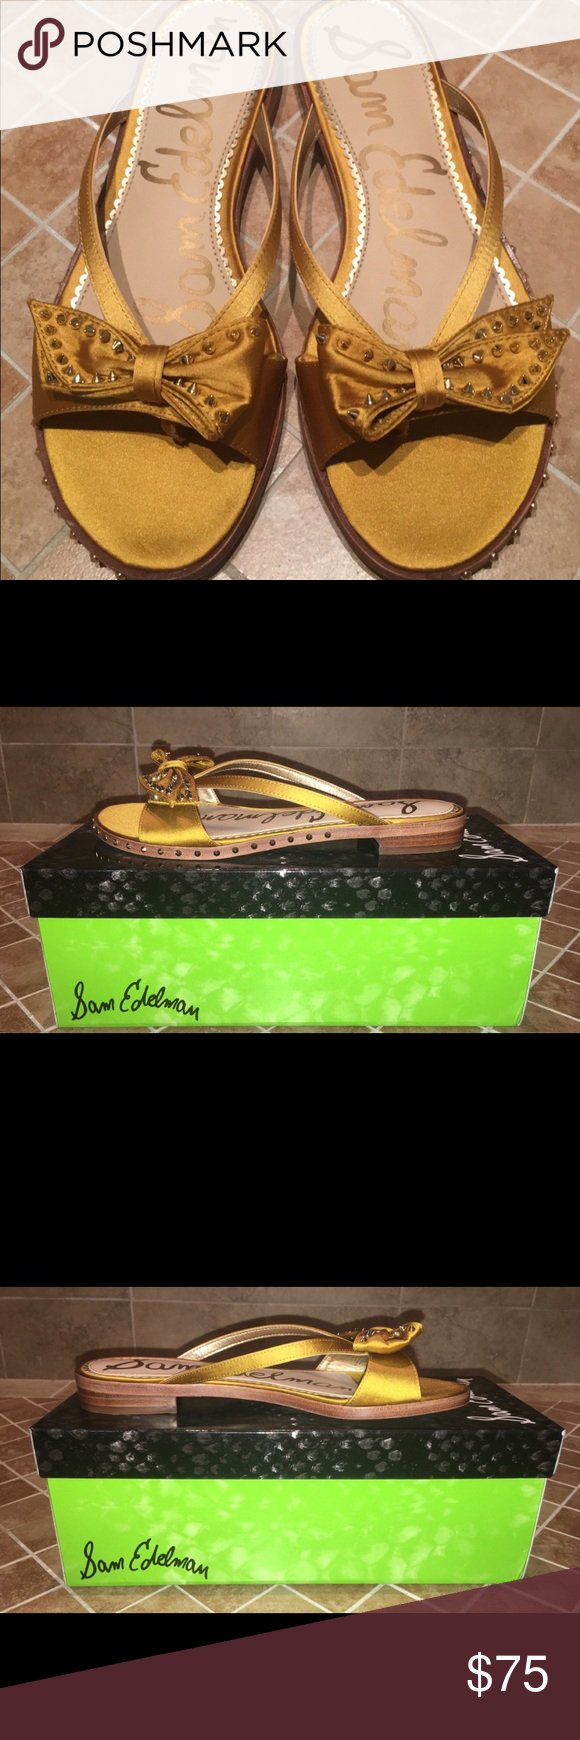 9e8e75b8d96b NIB Sam Edelman Dariel Studded Bow Slides Size 7 •Slides featuring studs  with ribbon decoration